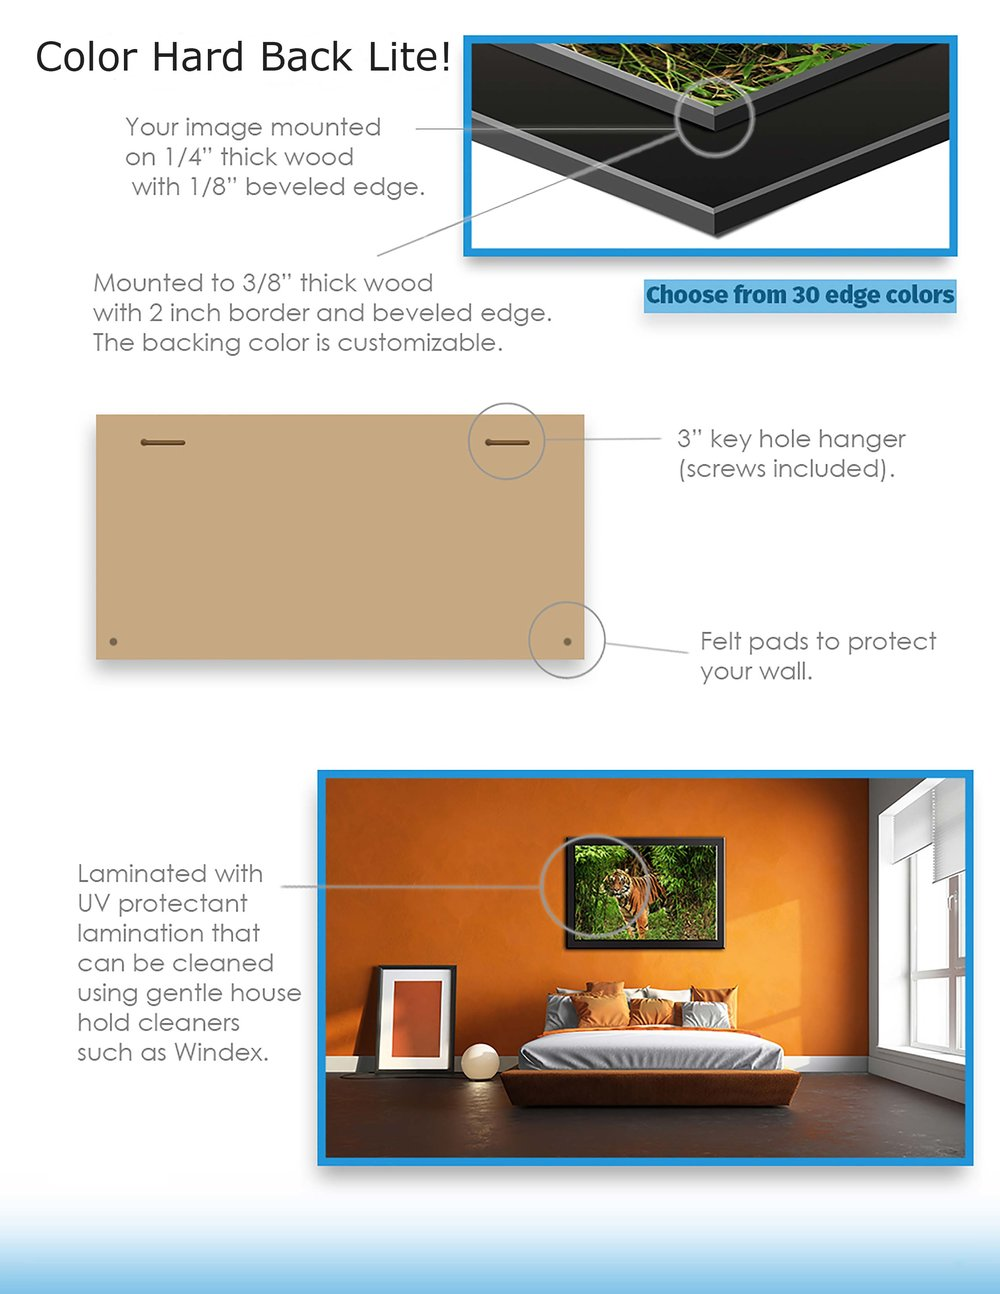 HDFW-ColorHardback-Lite-web-3300x2550.jpg